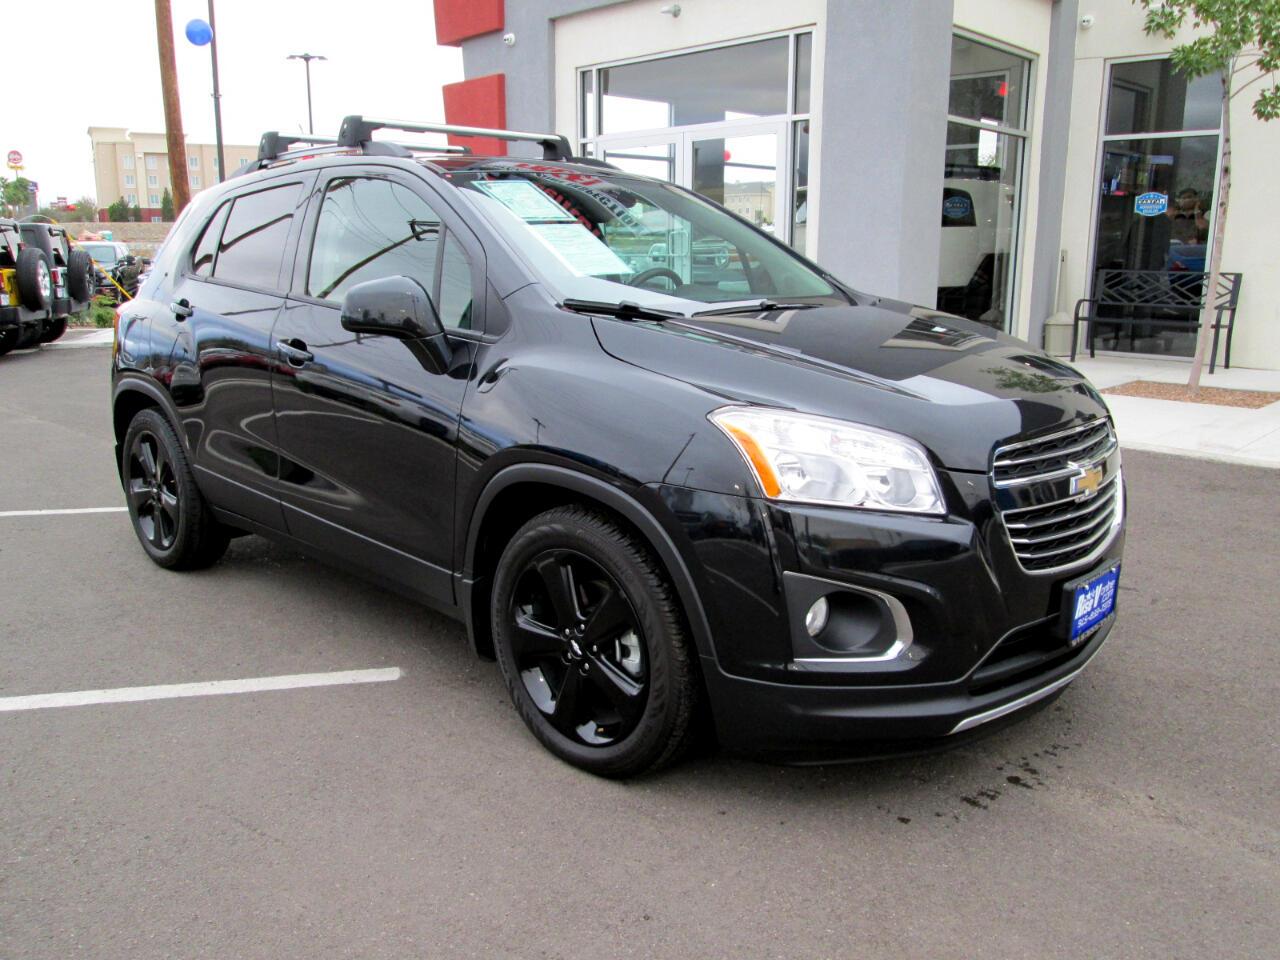 2016 Chevrolet Trax FWD 4dr LTZ